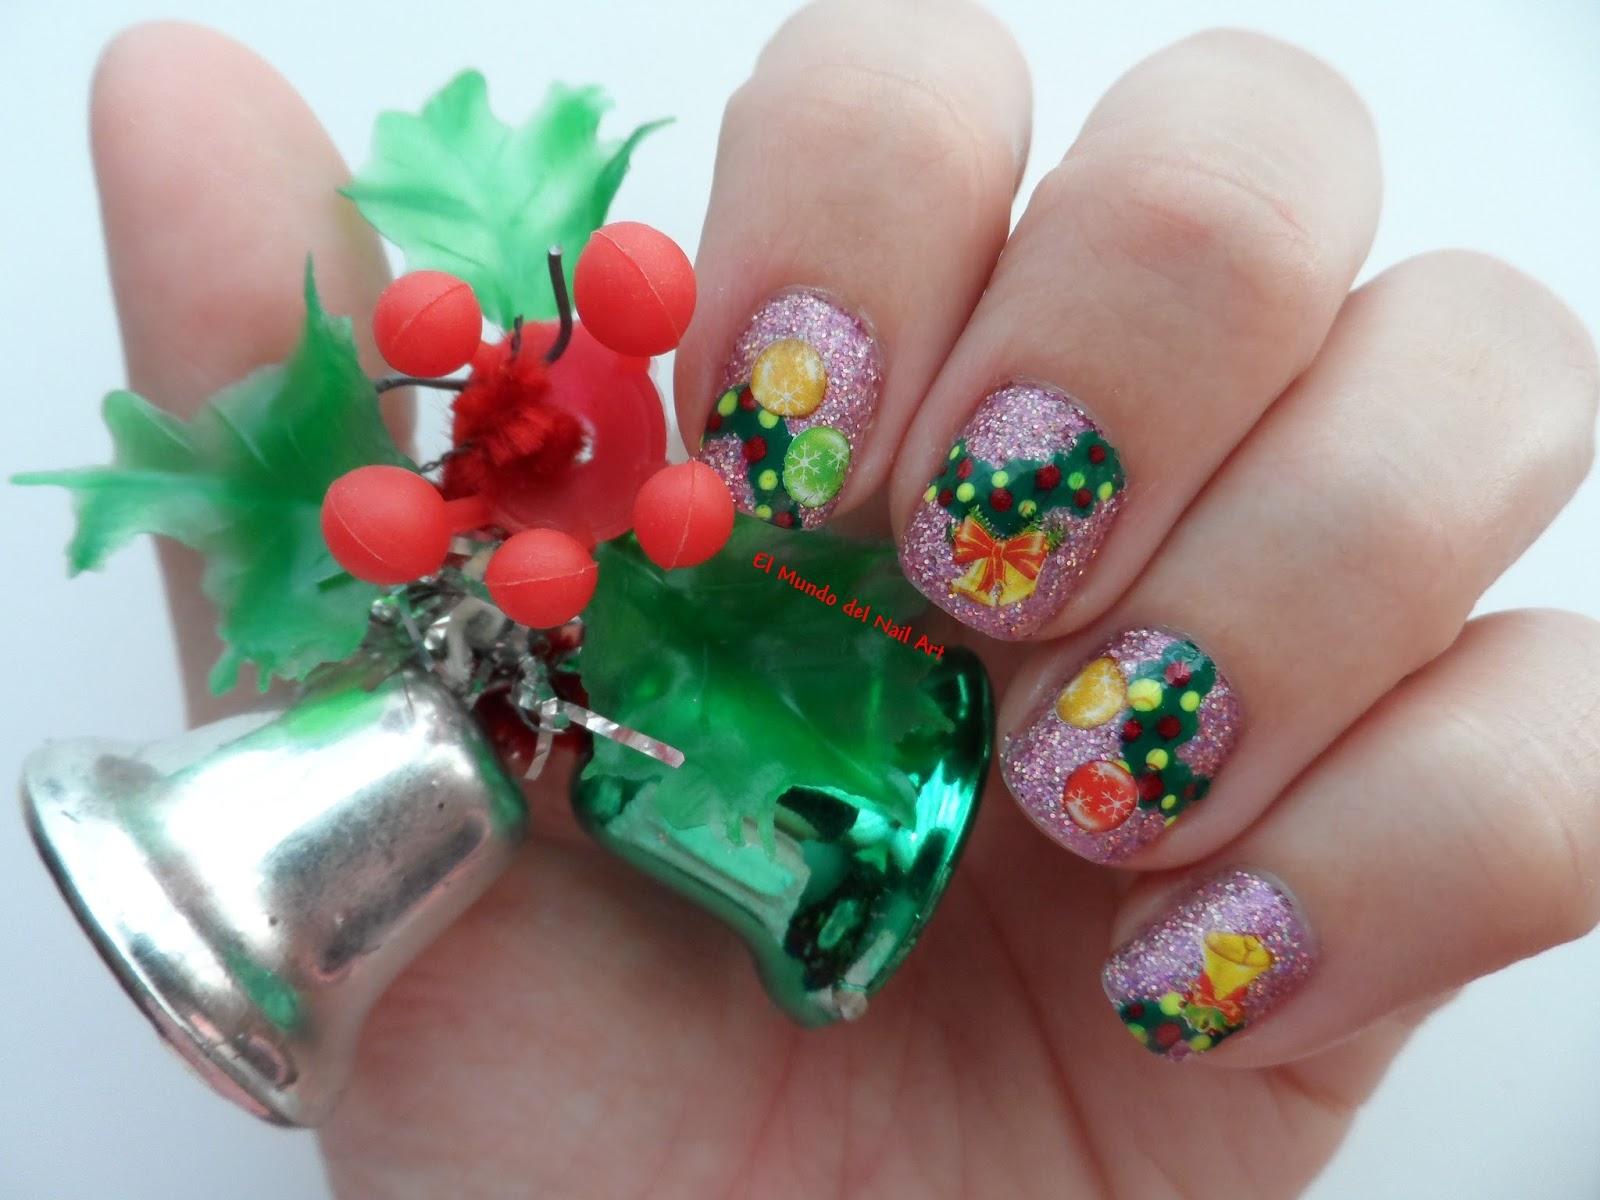 El Mundo del Nail Art: Manicura Corona de Navidad #RetoNapNavidad